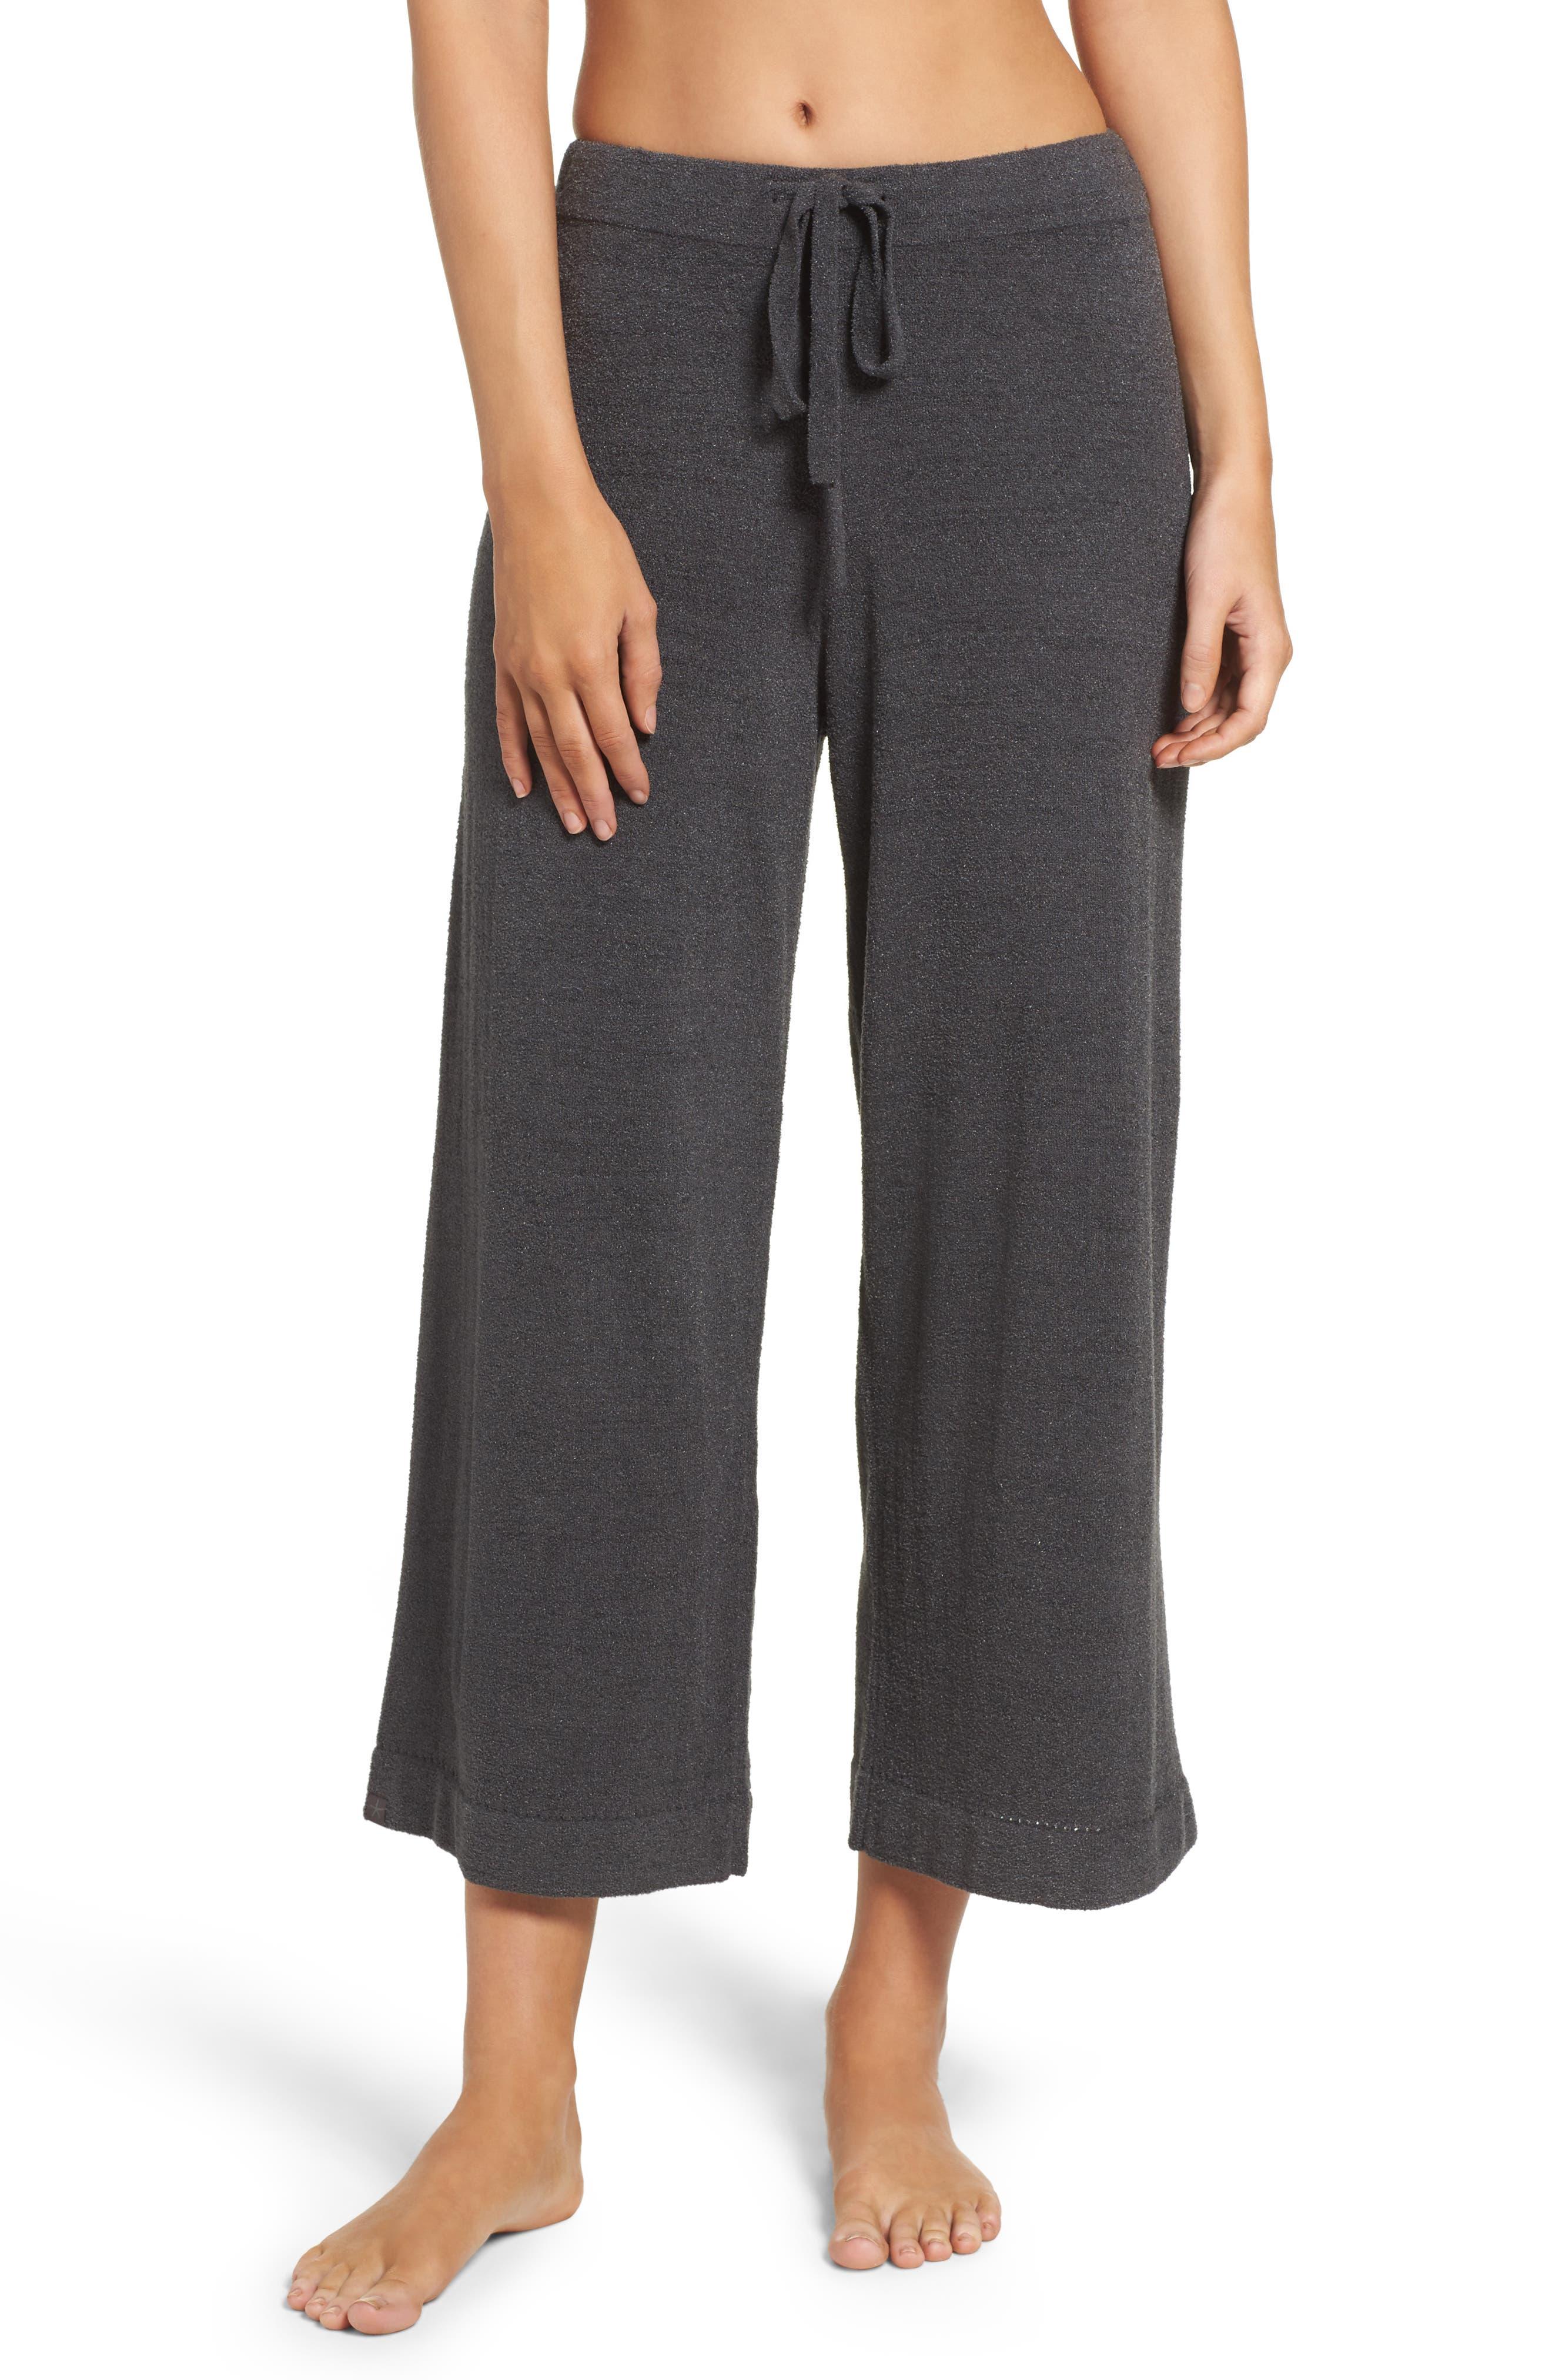 Barefoot Dreams® Cozychic Ultra Lite® Culotte Lounge Pants